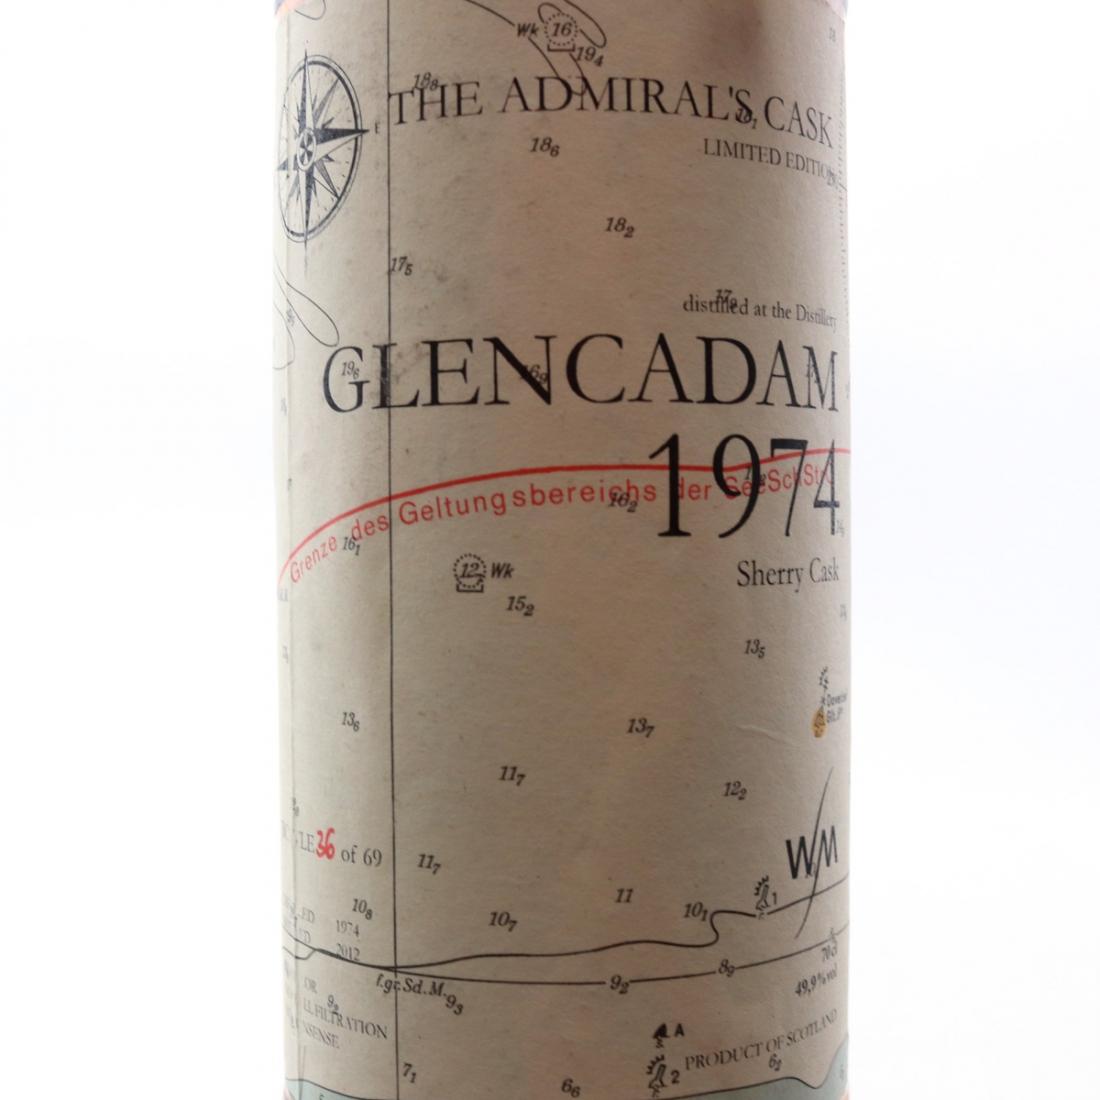 Glencadam 1974 Admiral's Cask